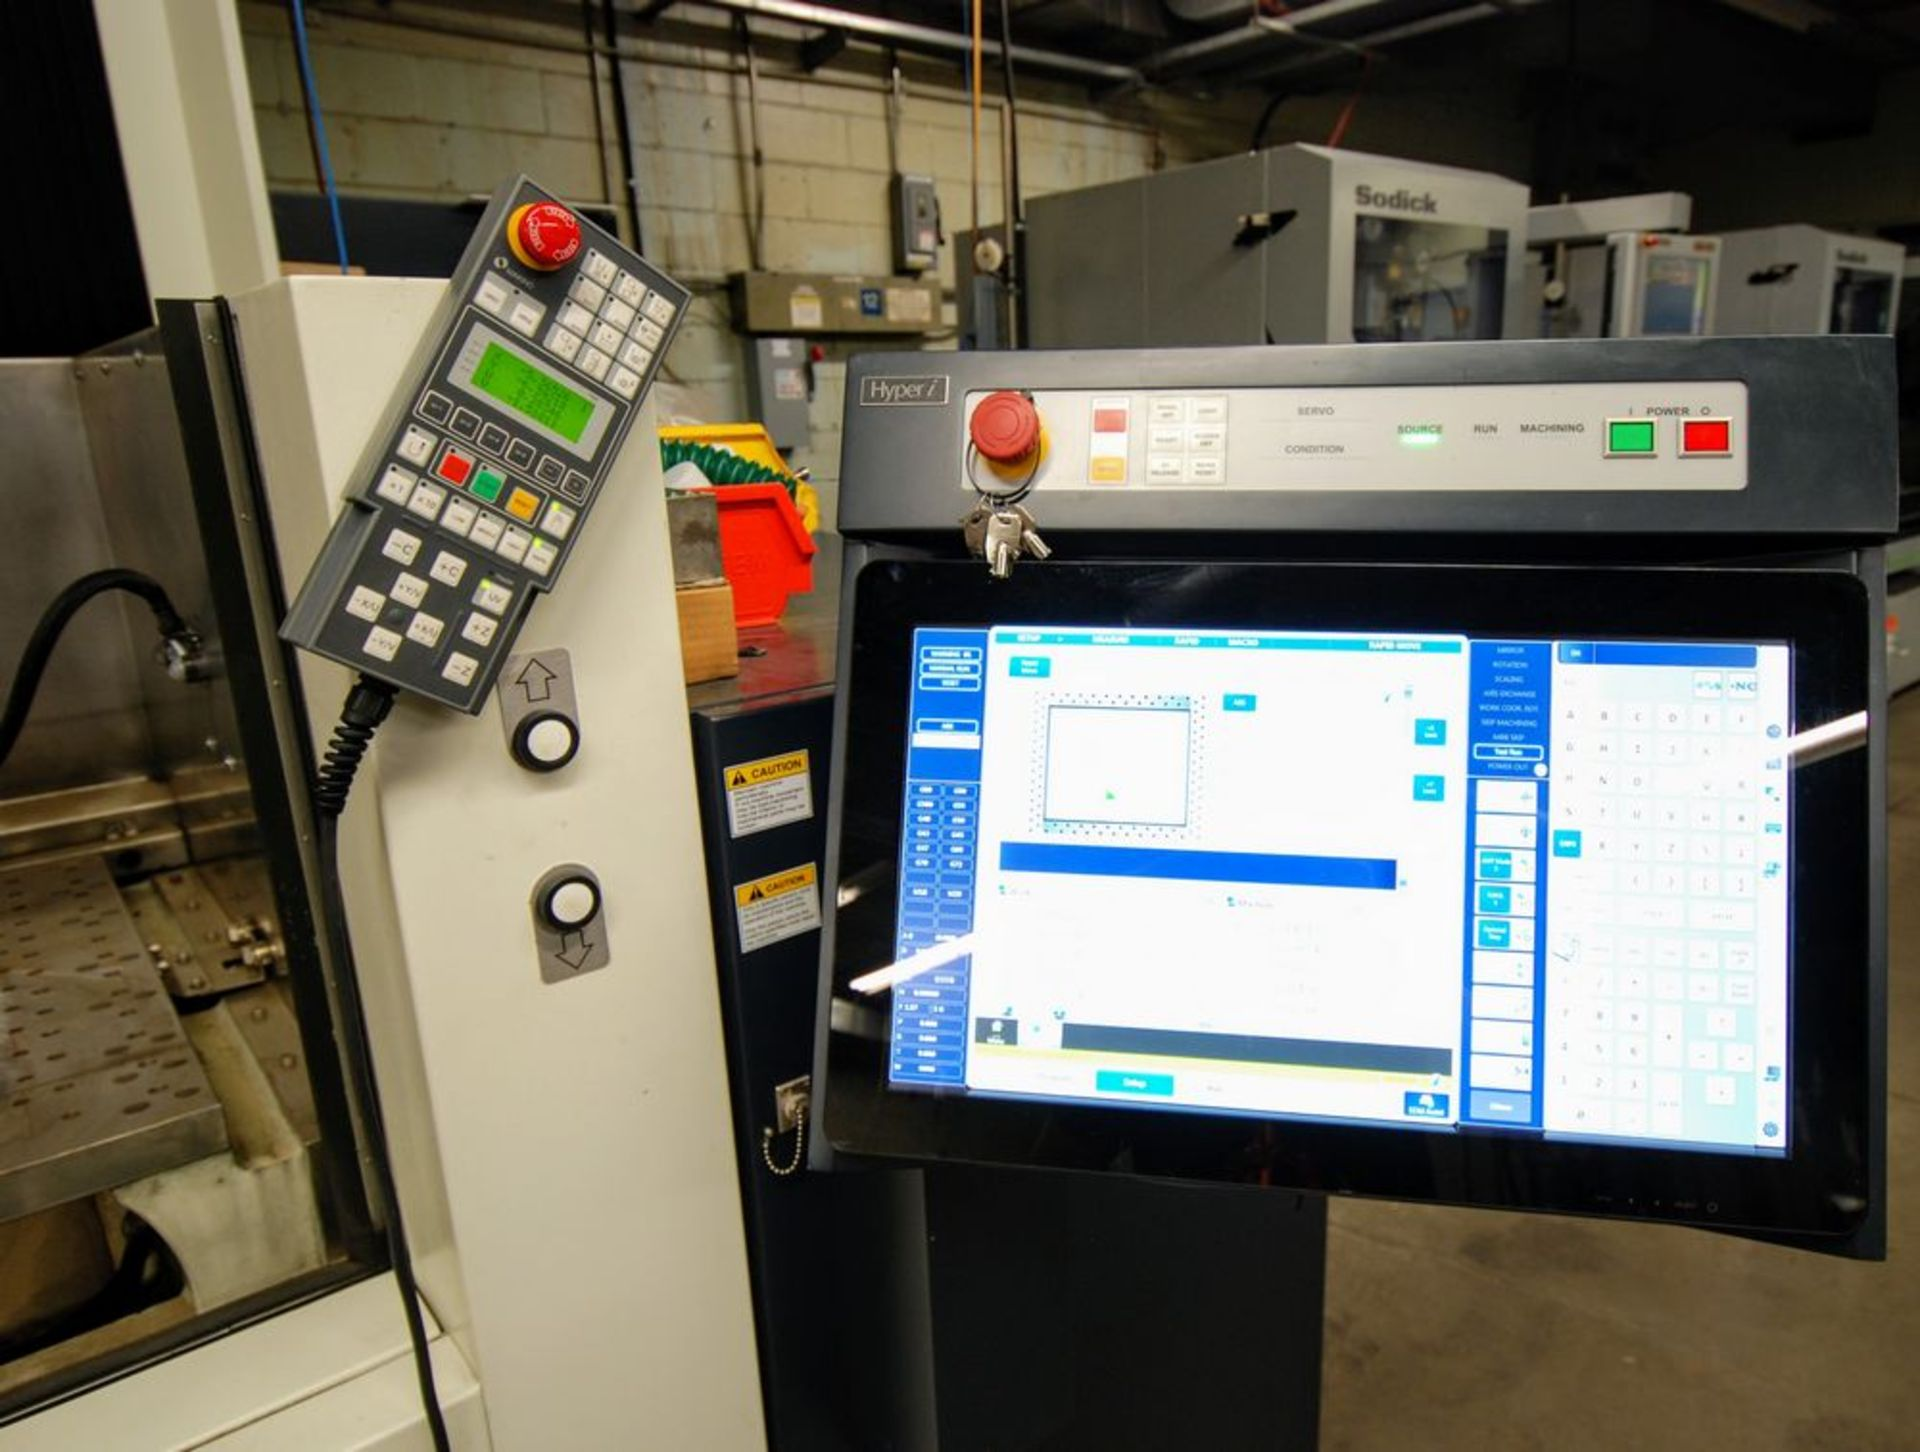 Lot 69 - 2018MAKINOU6 Wire EDM (installed Feb 2019), Hyper i CNC Control, s/n W150740, 55hrs, Travels: X-